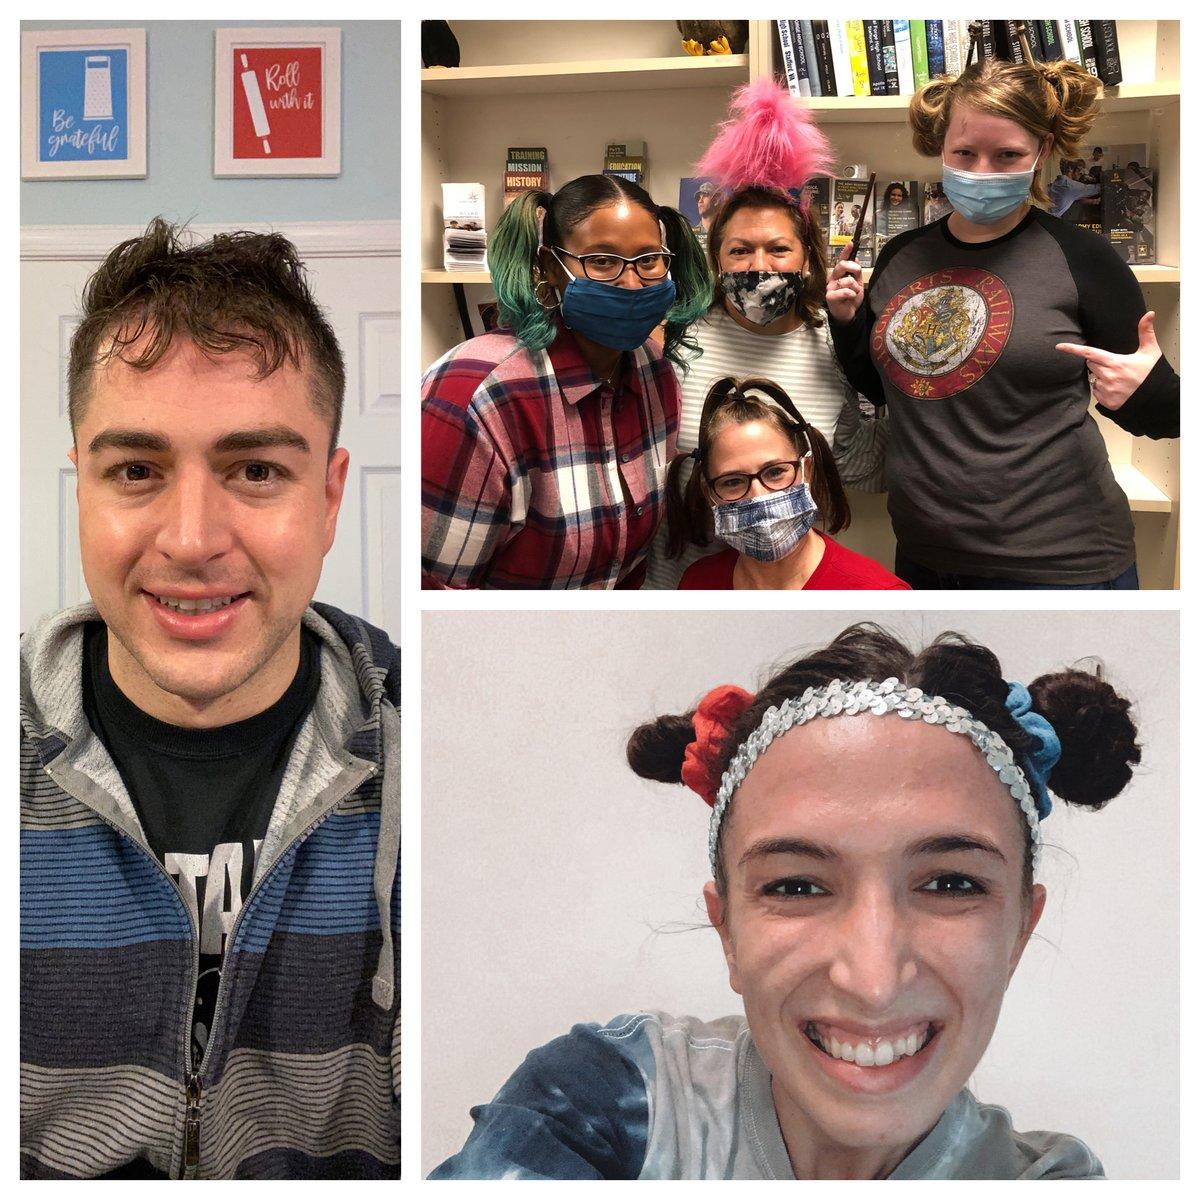 Happy Crazy Hair Day!! https://t.co/1oViMynSnI